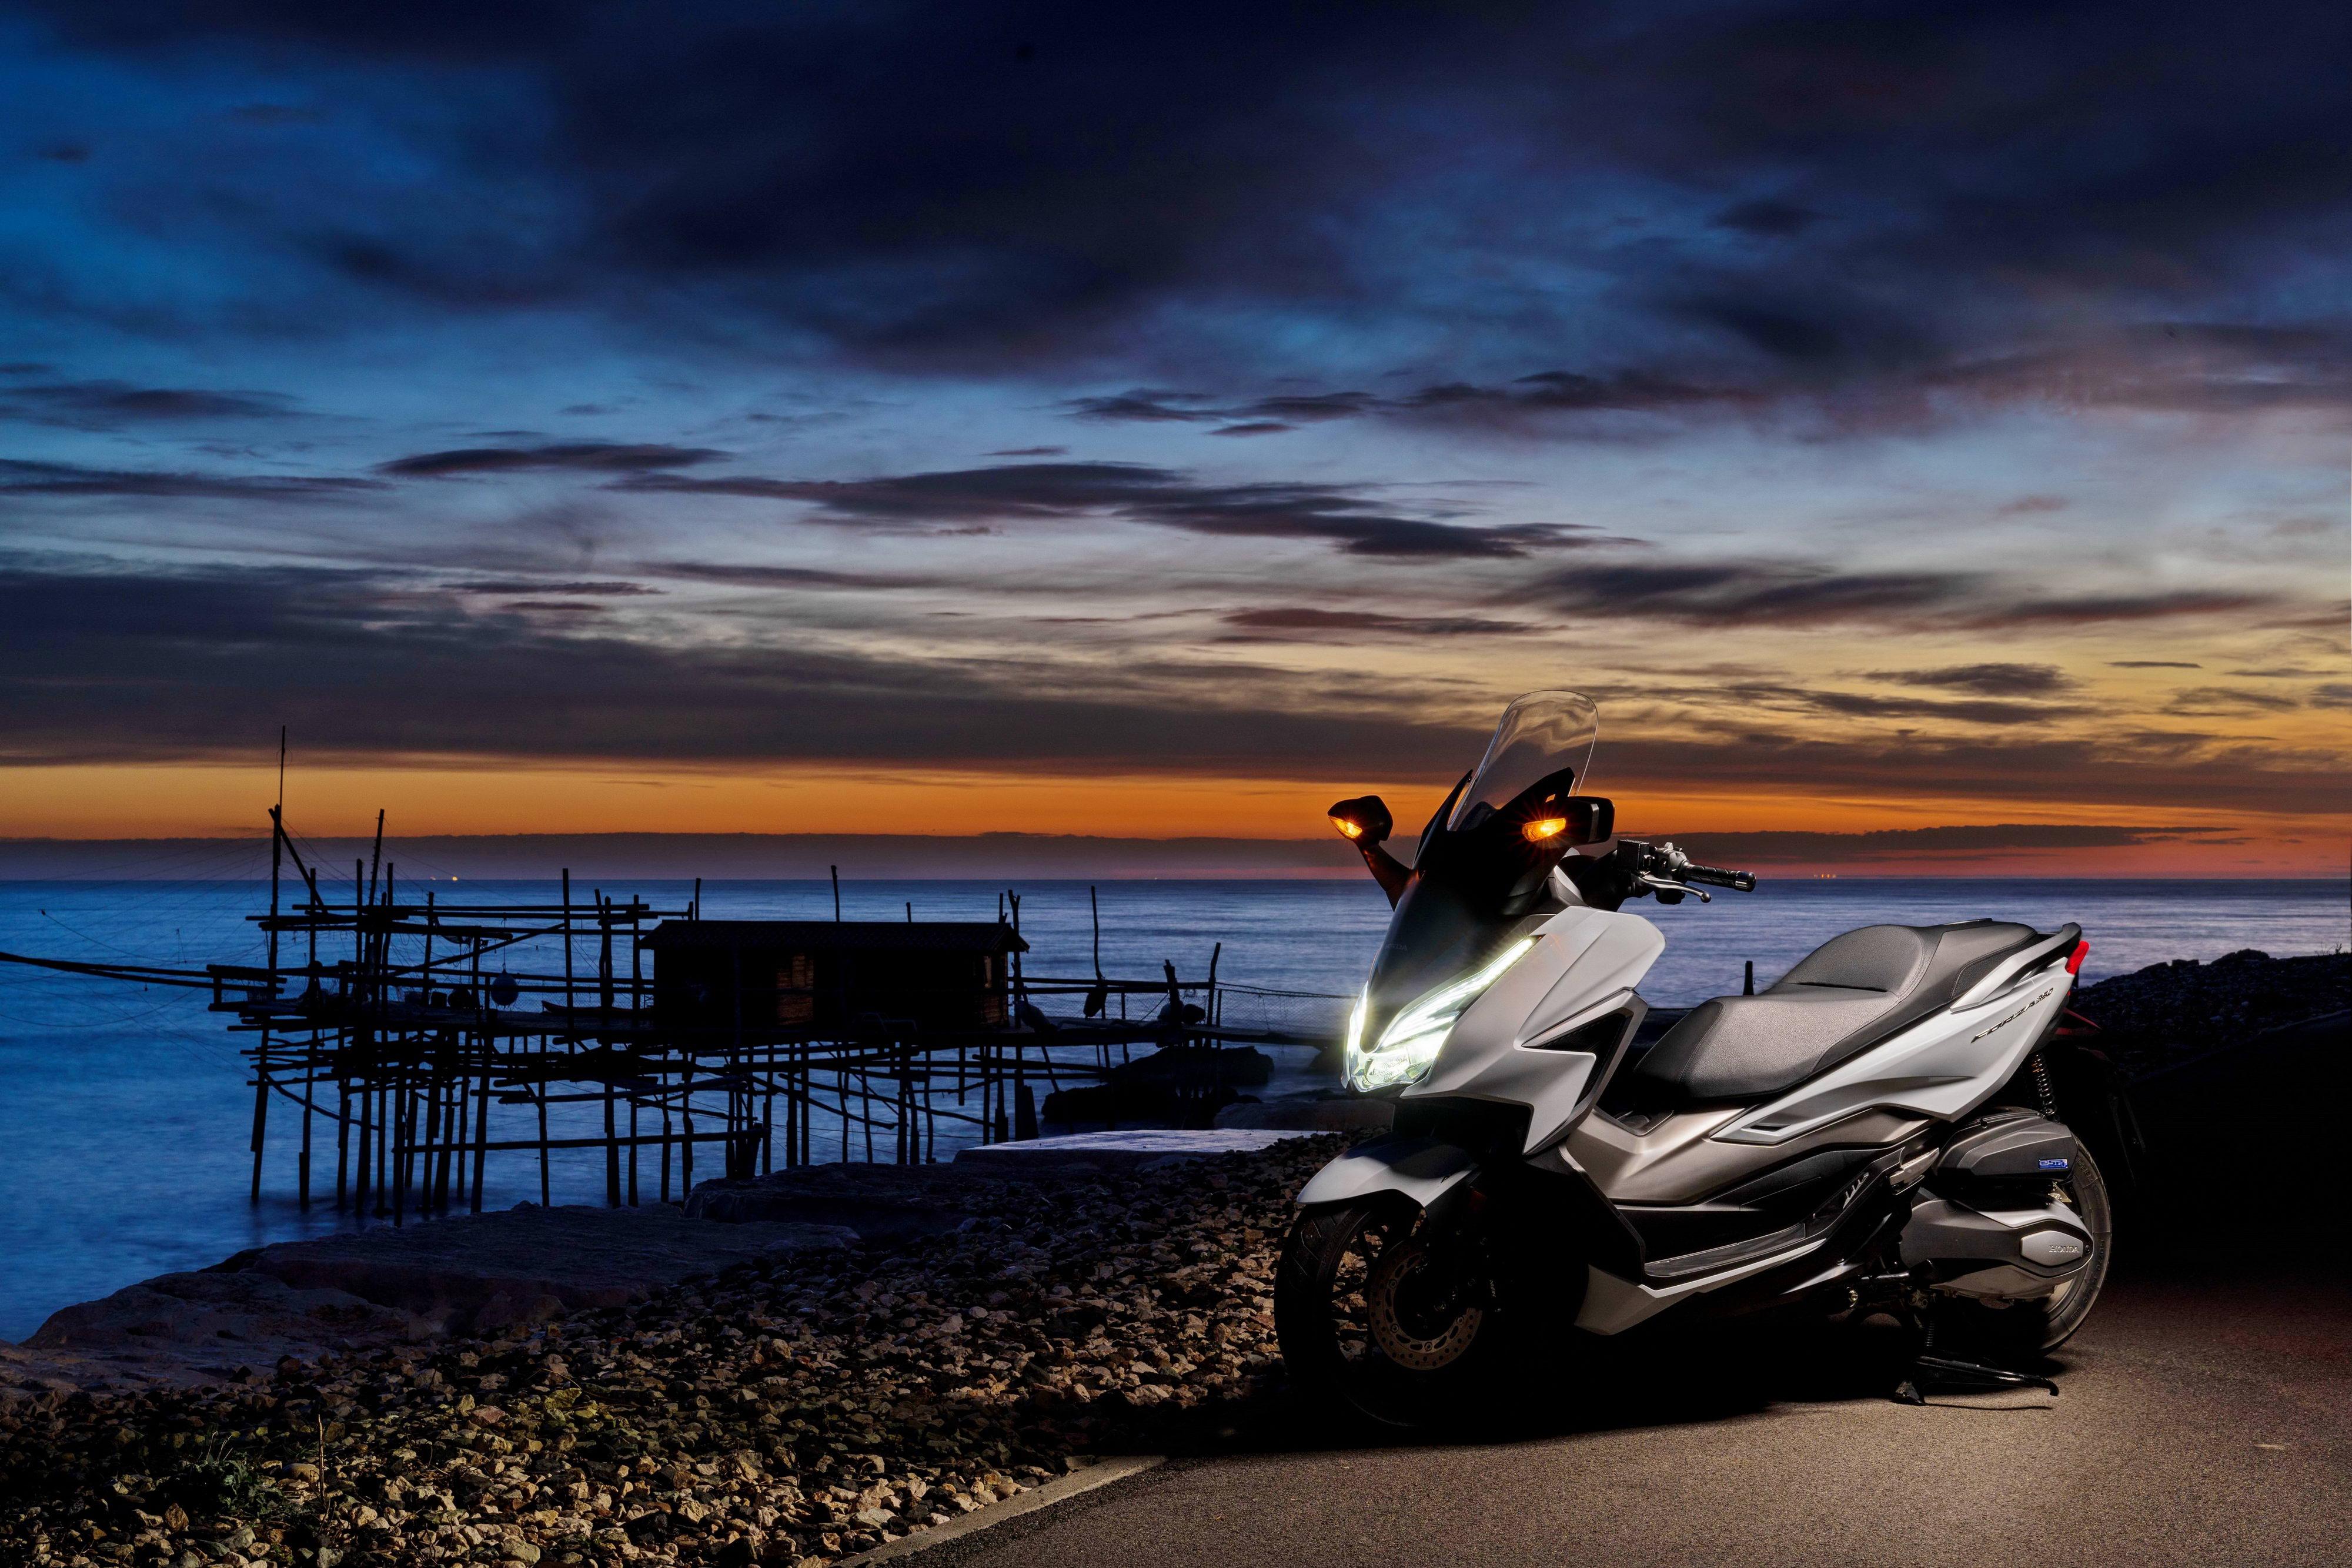 本田 Honda佛沙350Forza350高清:Honda 2021 Forza 350 �敉馓��